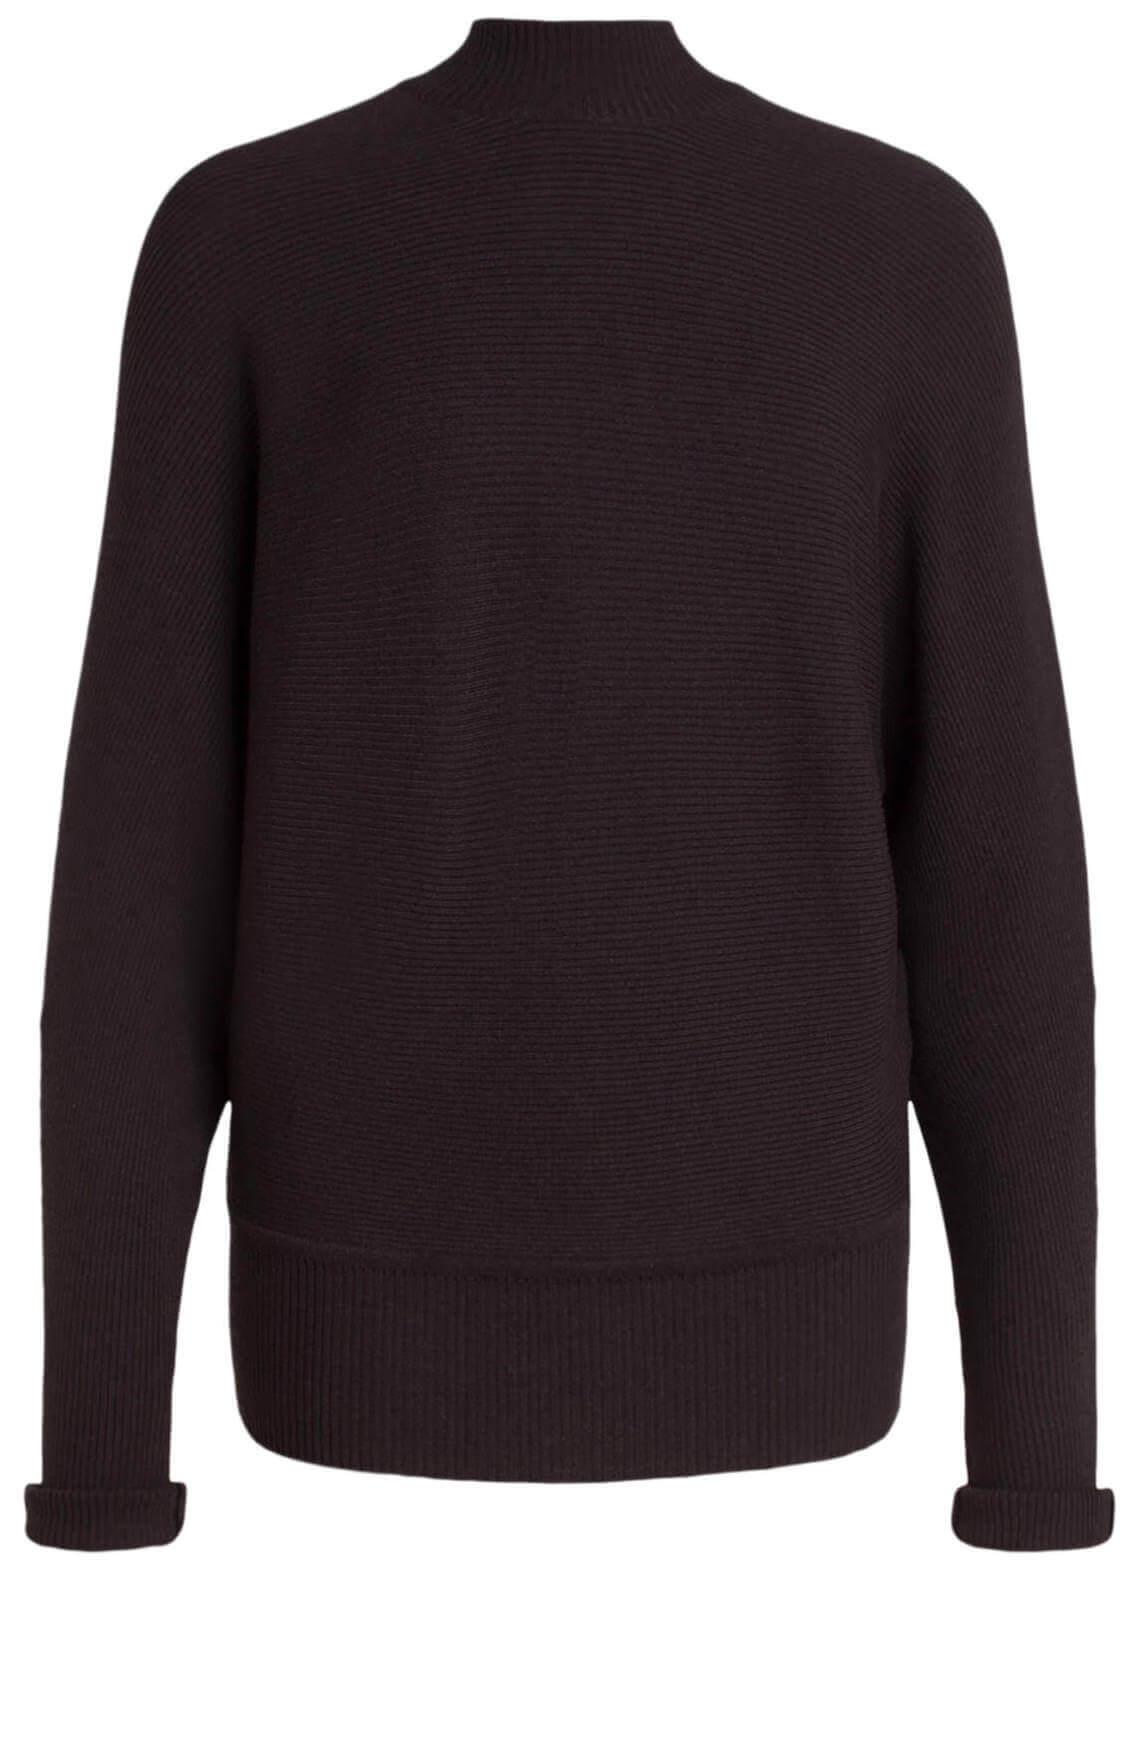 10 Days Dames Ribgebreide pullover met cashmere Grijs